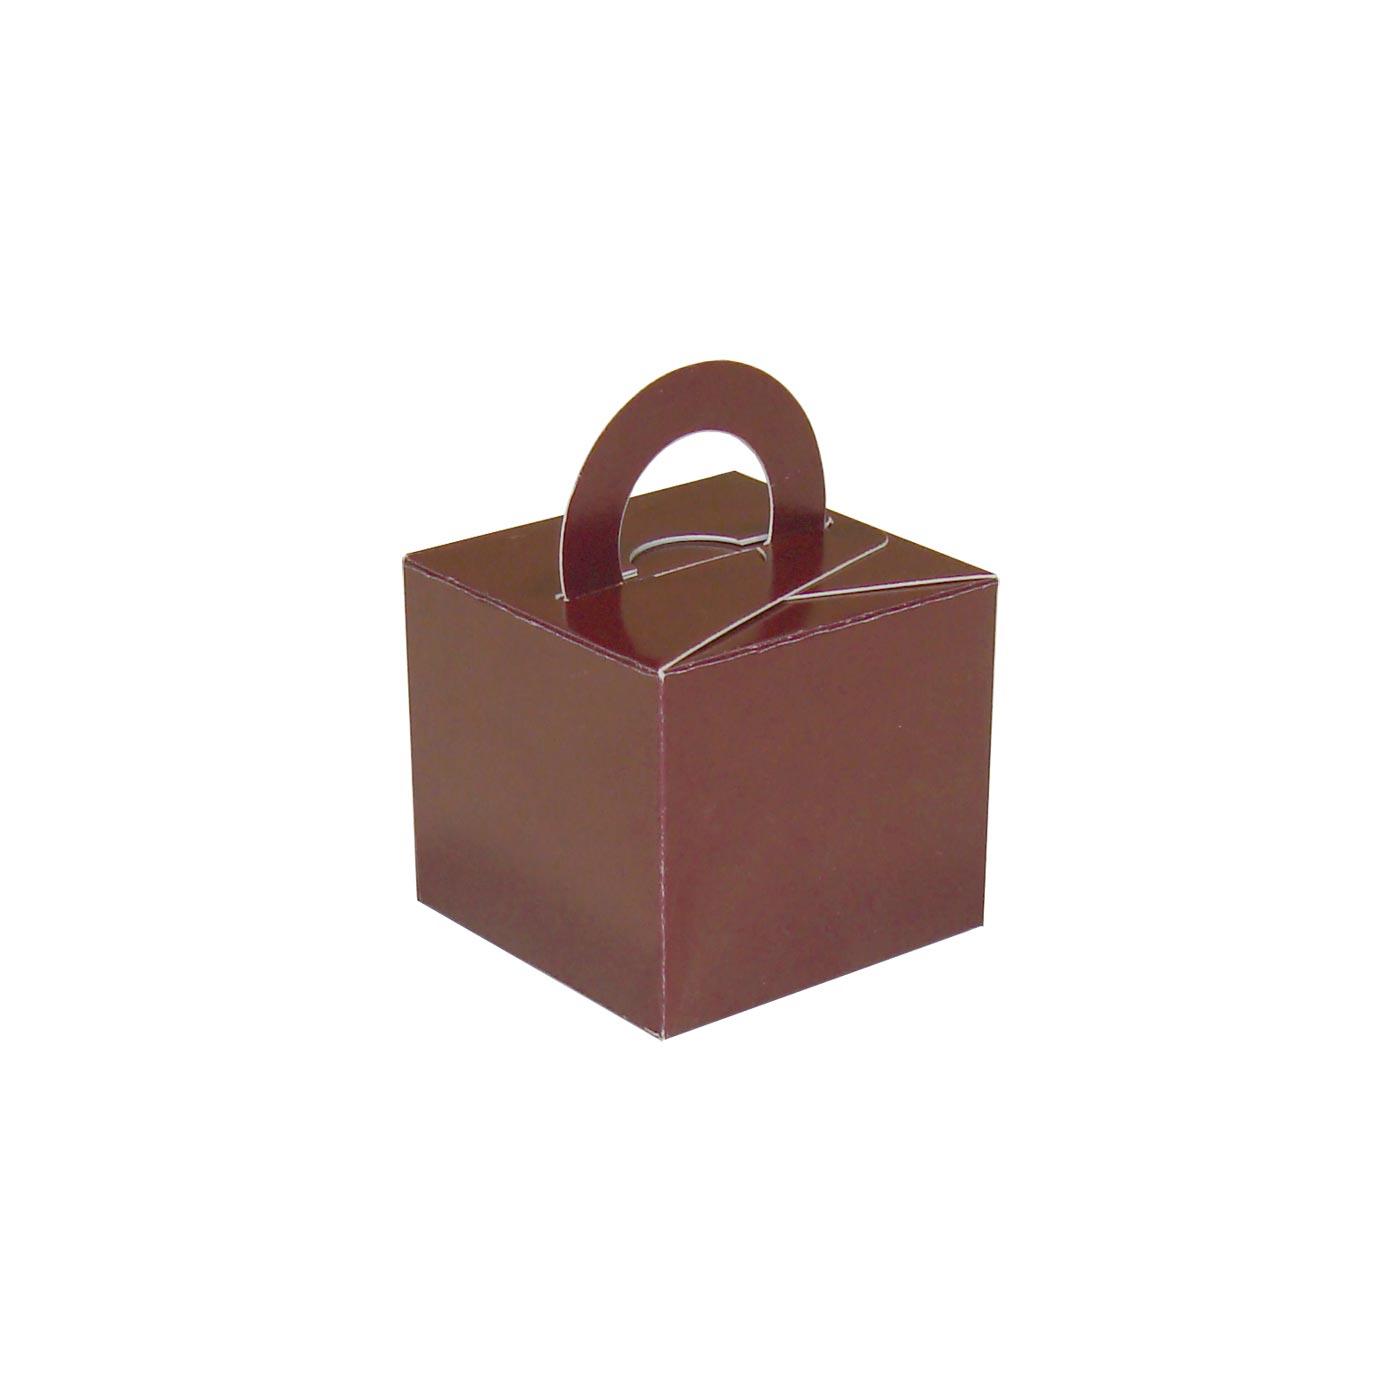 Chocolate Balloon Weight Box